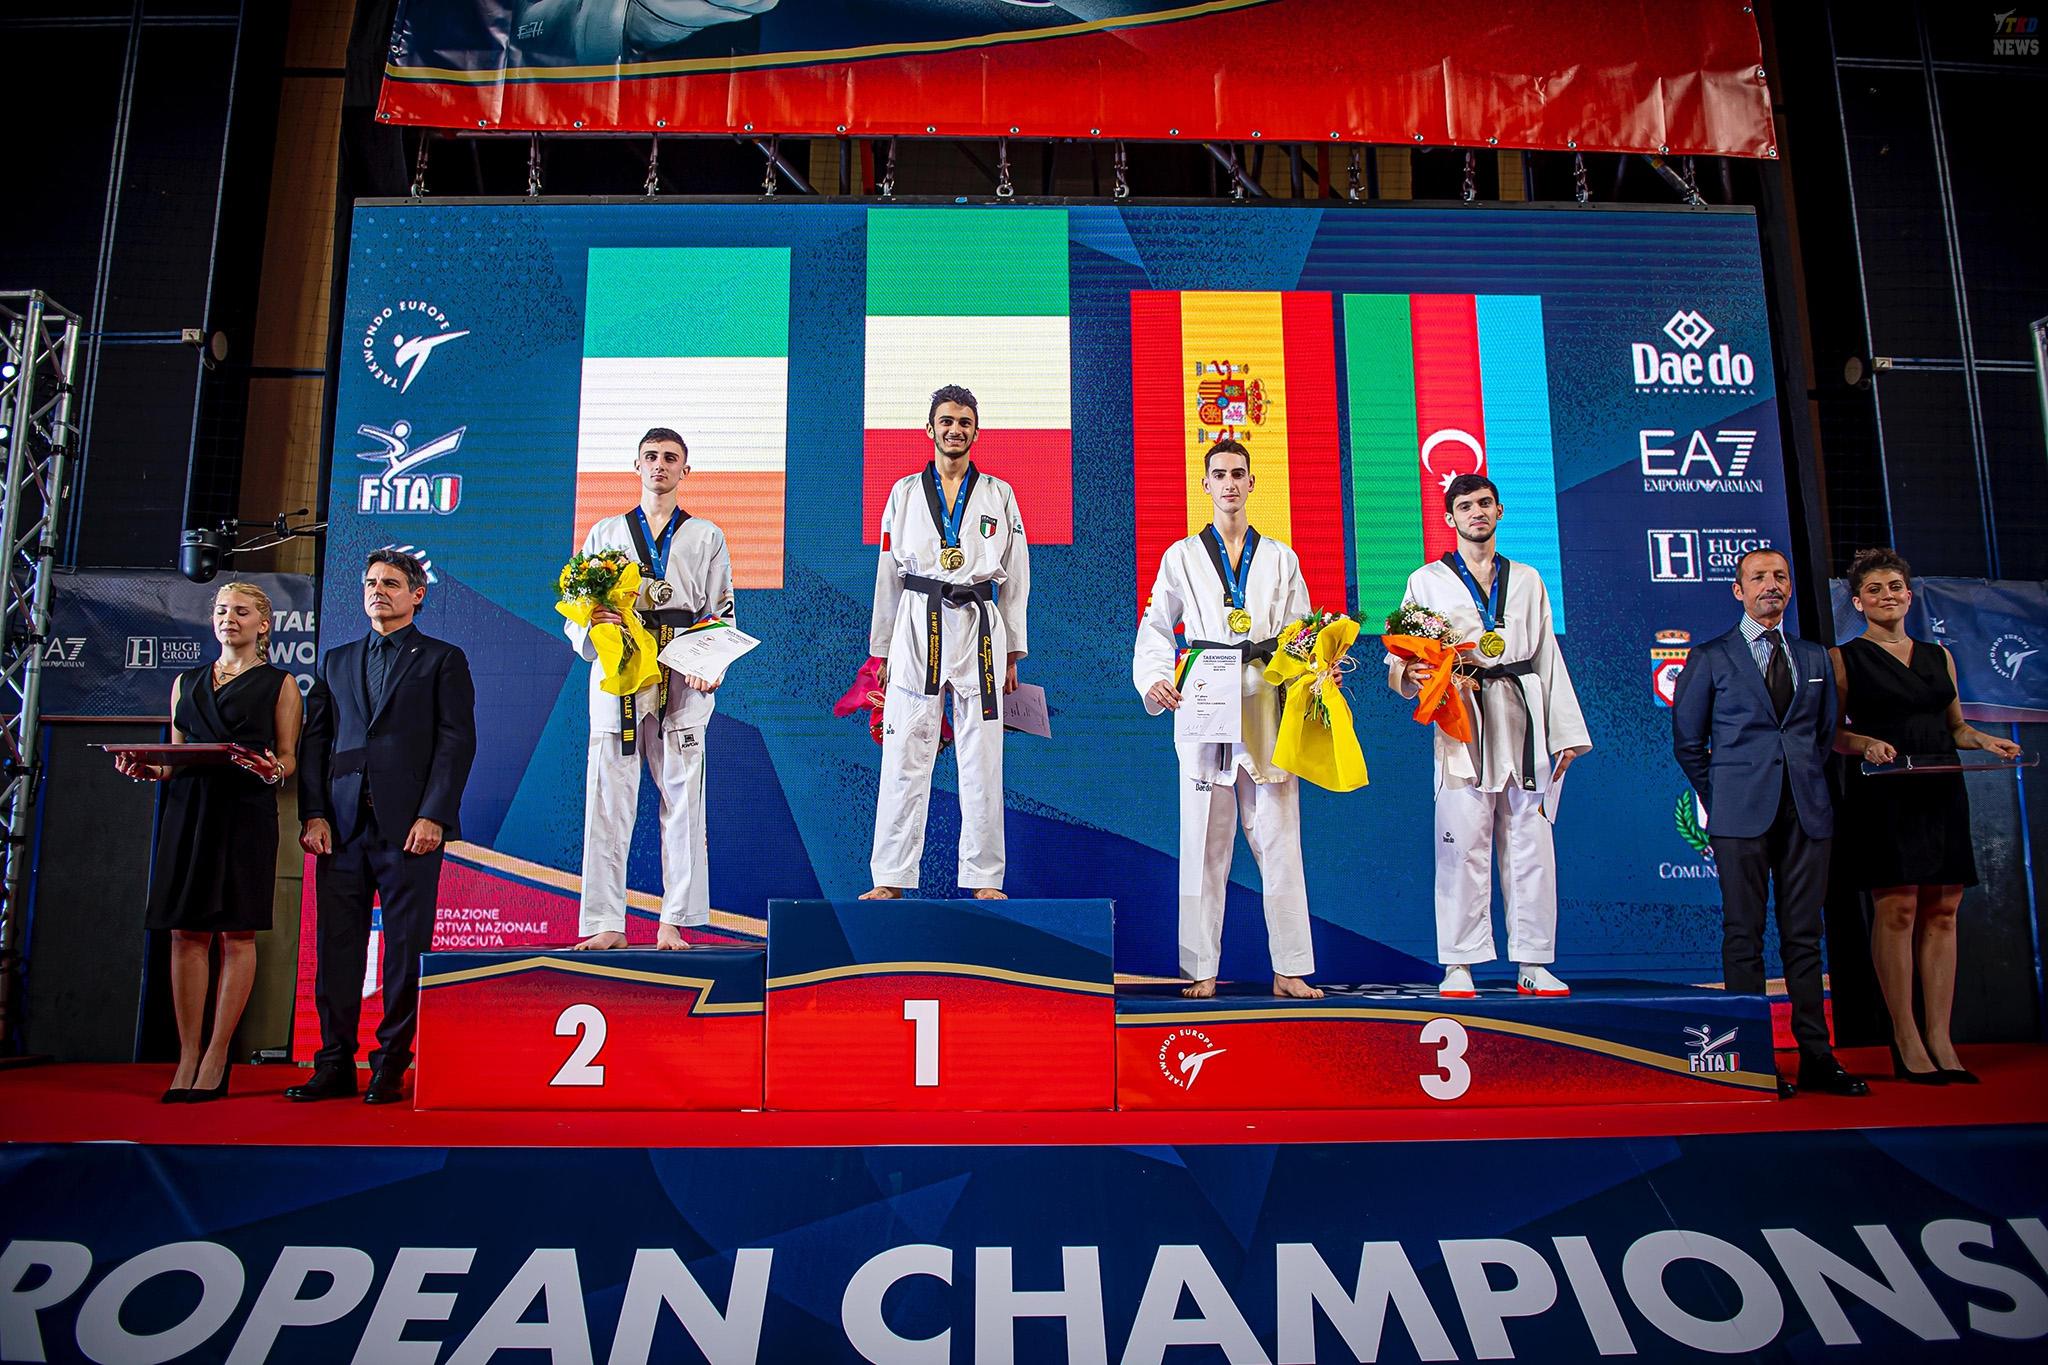 1572789973_male-58b_g4-extra-european-taekwondo-championships-bari-2019